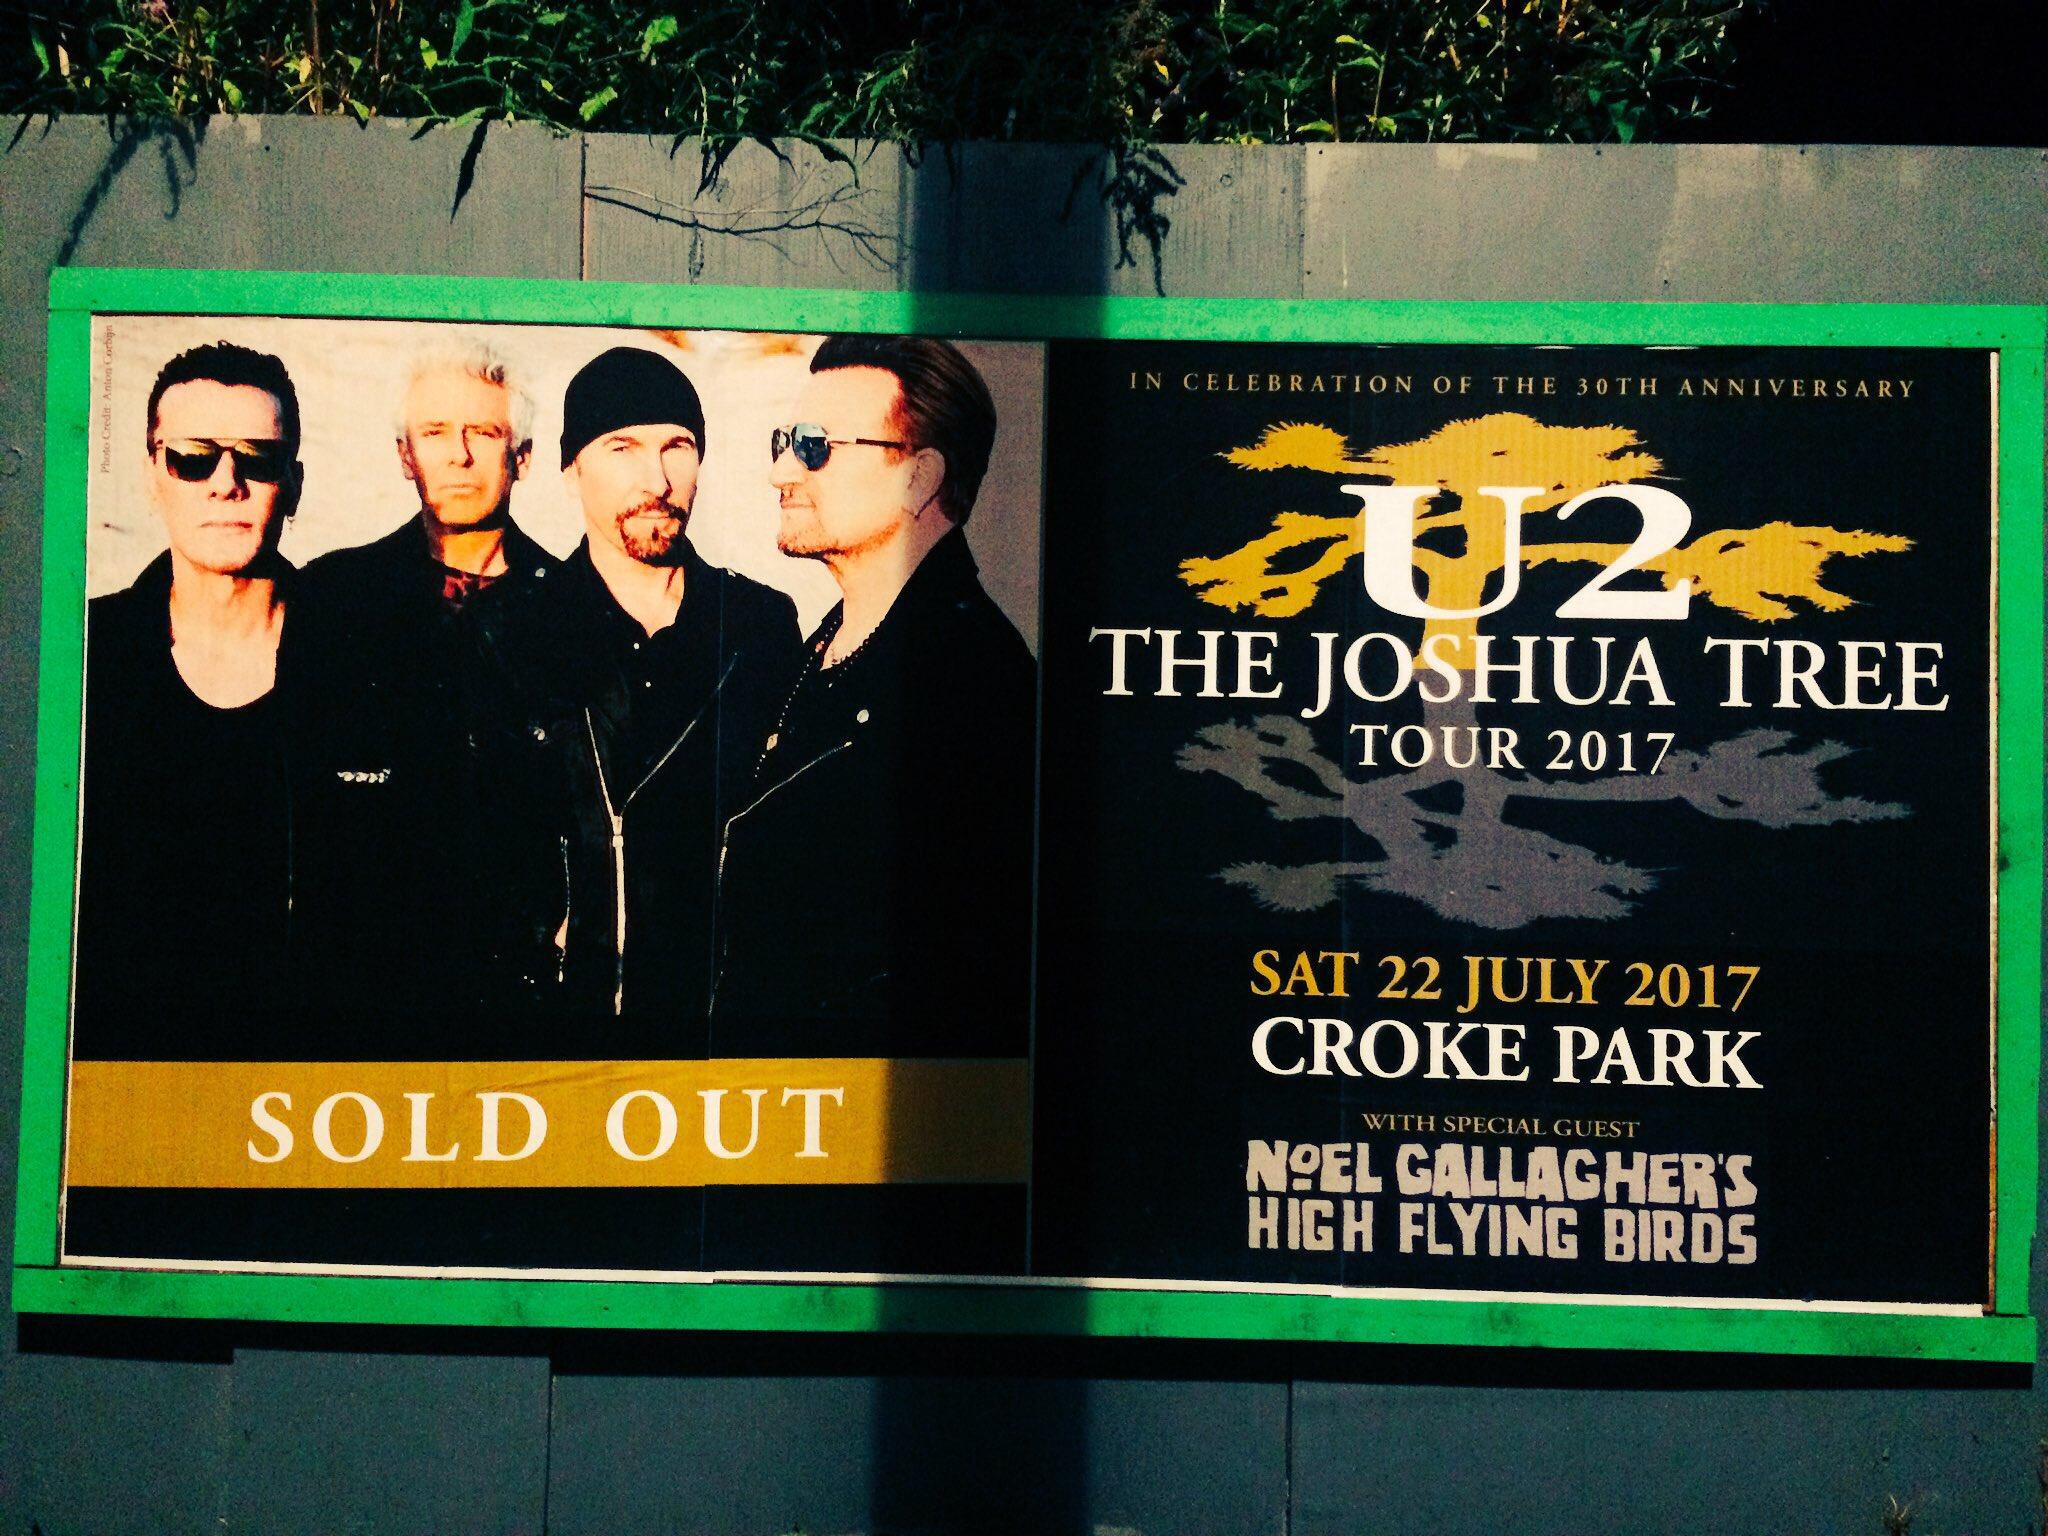 J-2 #U2 #U2TheJoshuaTree2017  #U2JoshuaTreeTour2017 #U2Dublin https://t.co/4d50xWeLch